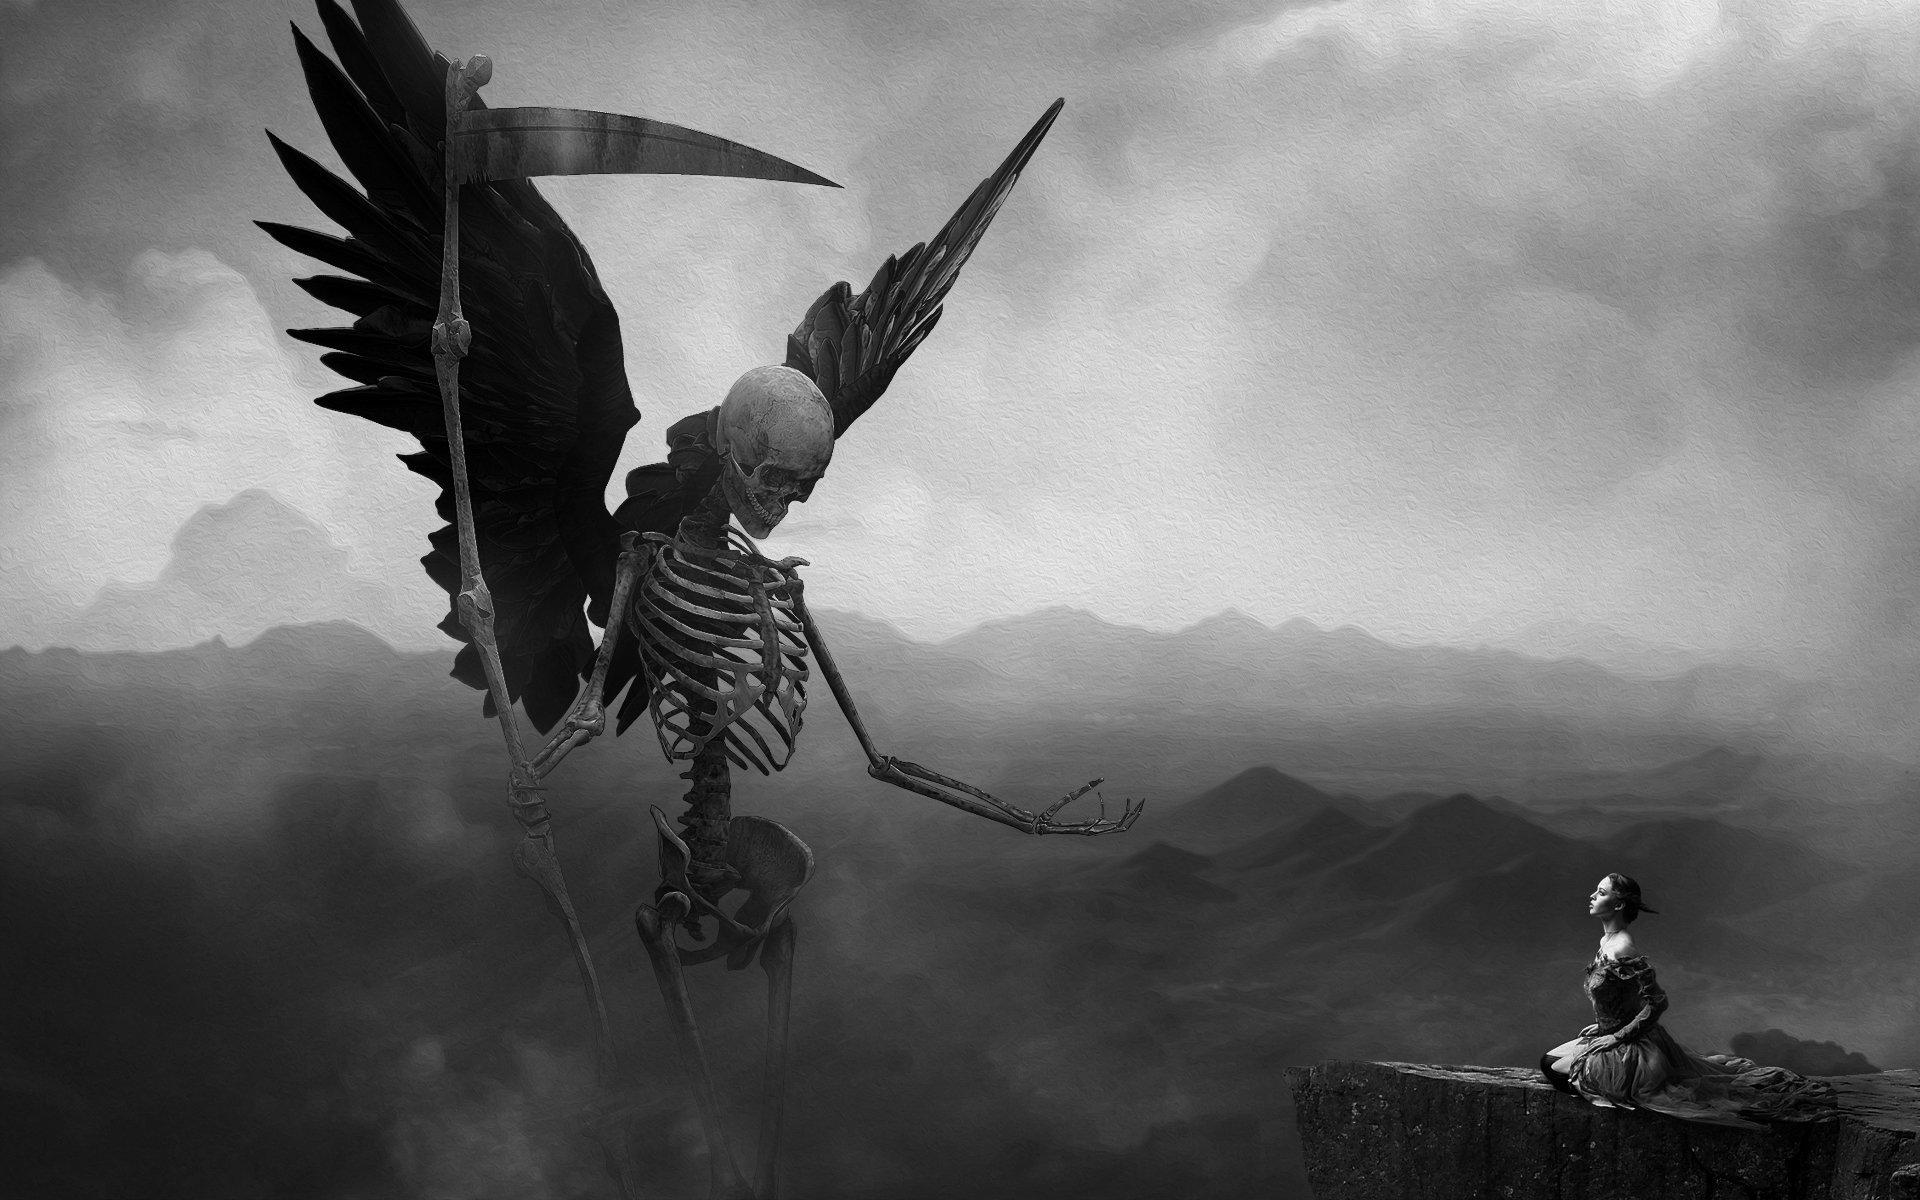 Skeleton death girl on knees